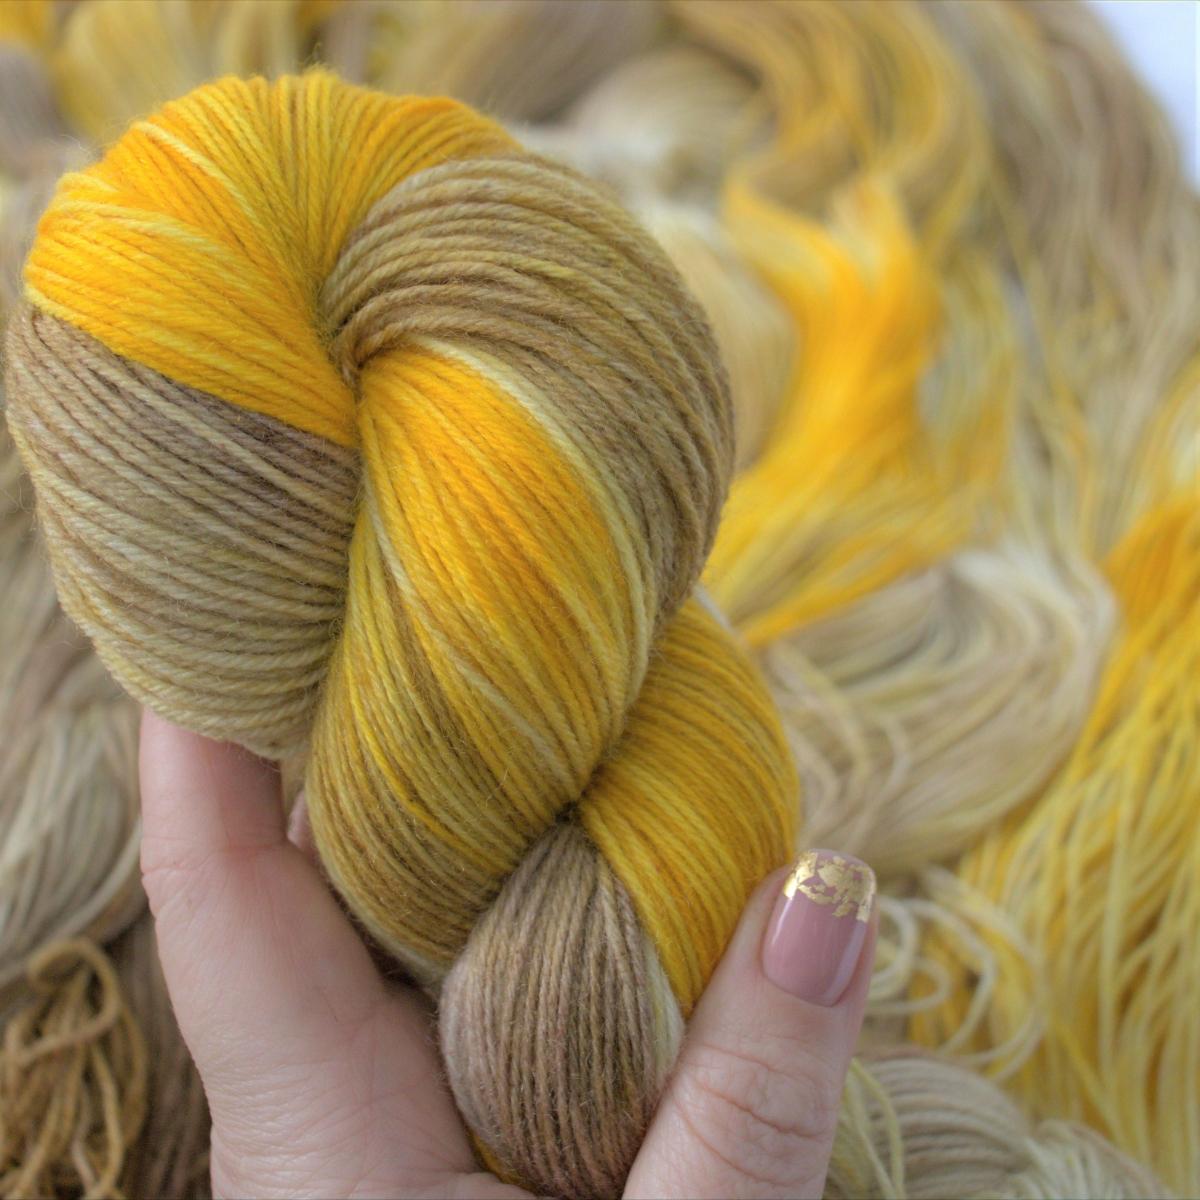 woodico.pro hand dyed yarn 049 1200x1200 - Hand dyed yarn / 049